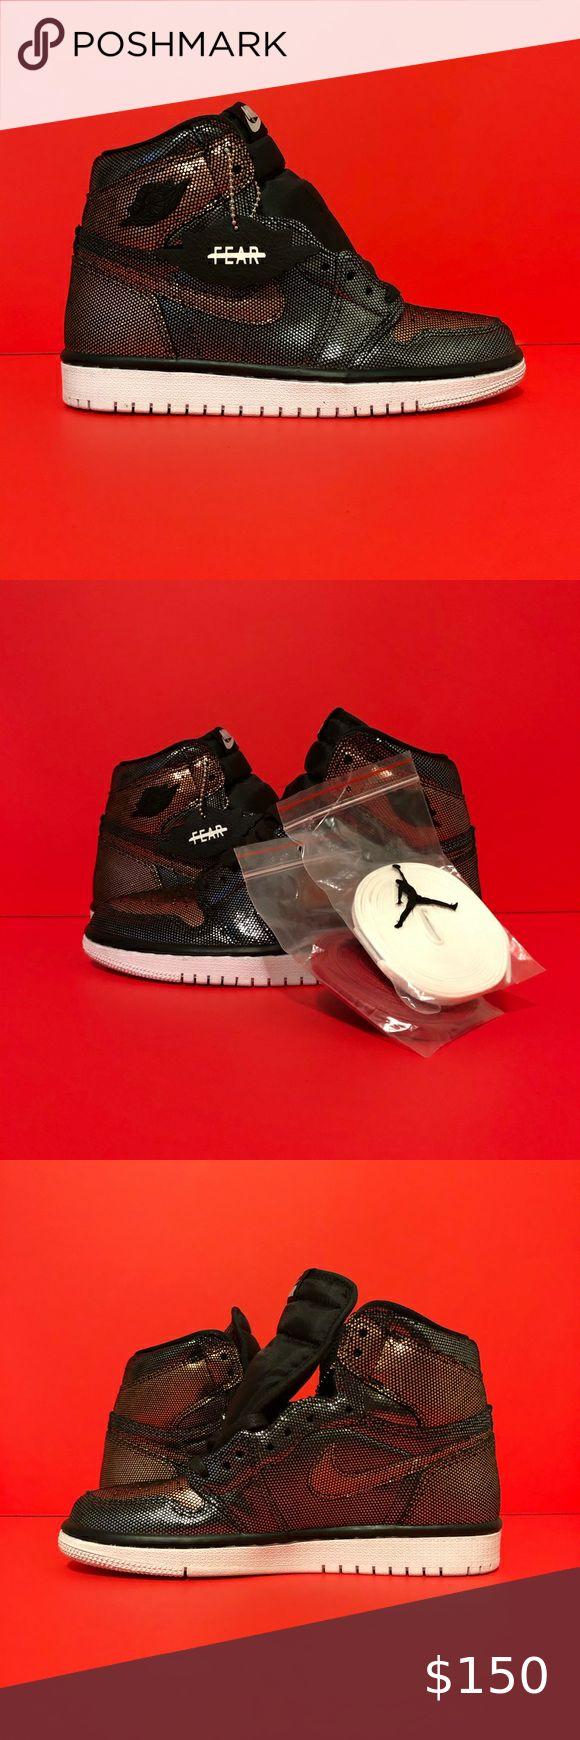 Nike Air Jordan 1 Retro High Fearless Brand New in 2020